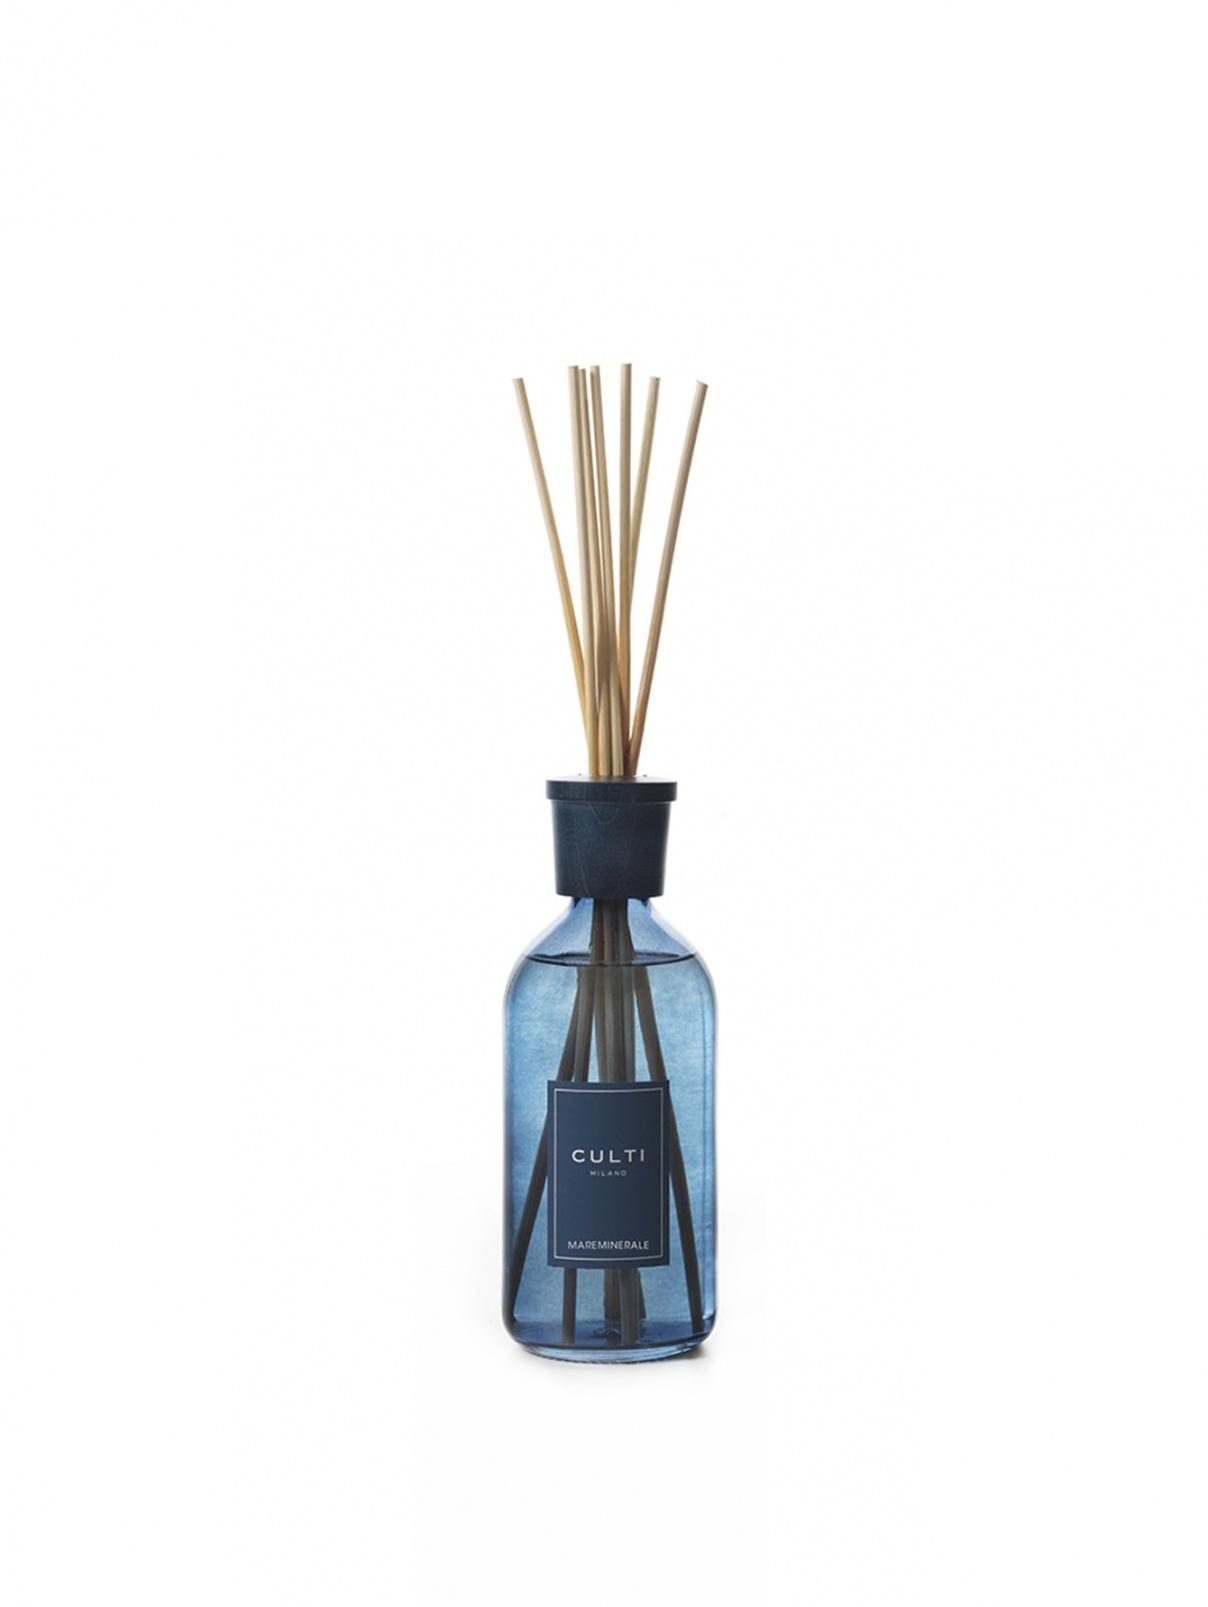 Stile Colours Blue диффузор Mareminerale 500 мл Home Fragrance Culti Milano  –  Общий вид